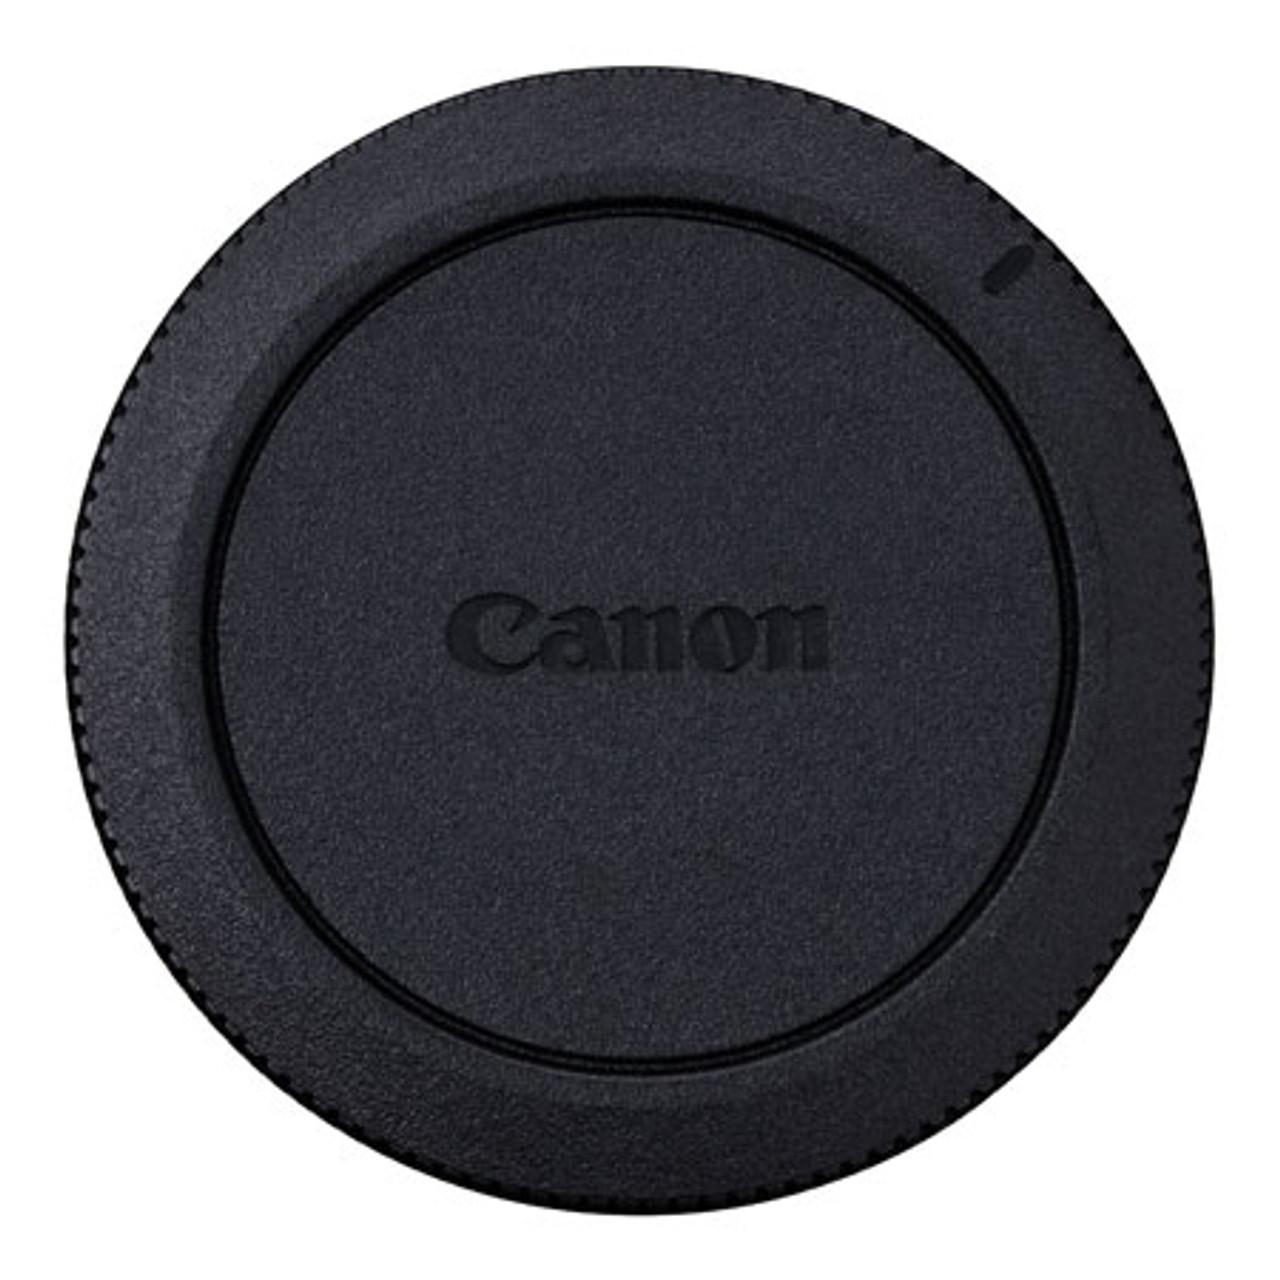 CANON RF MOUNT BODY CAP RF-5